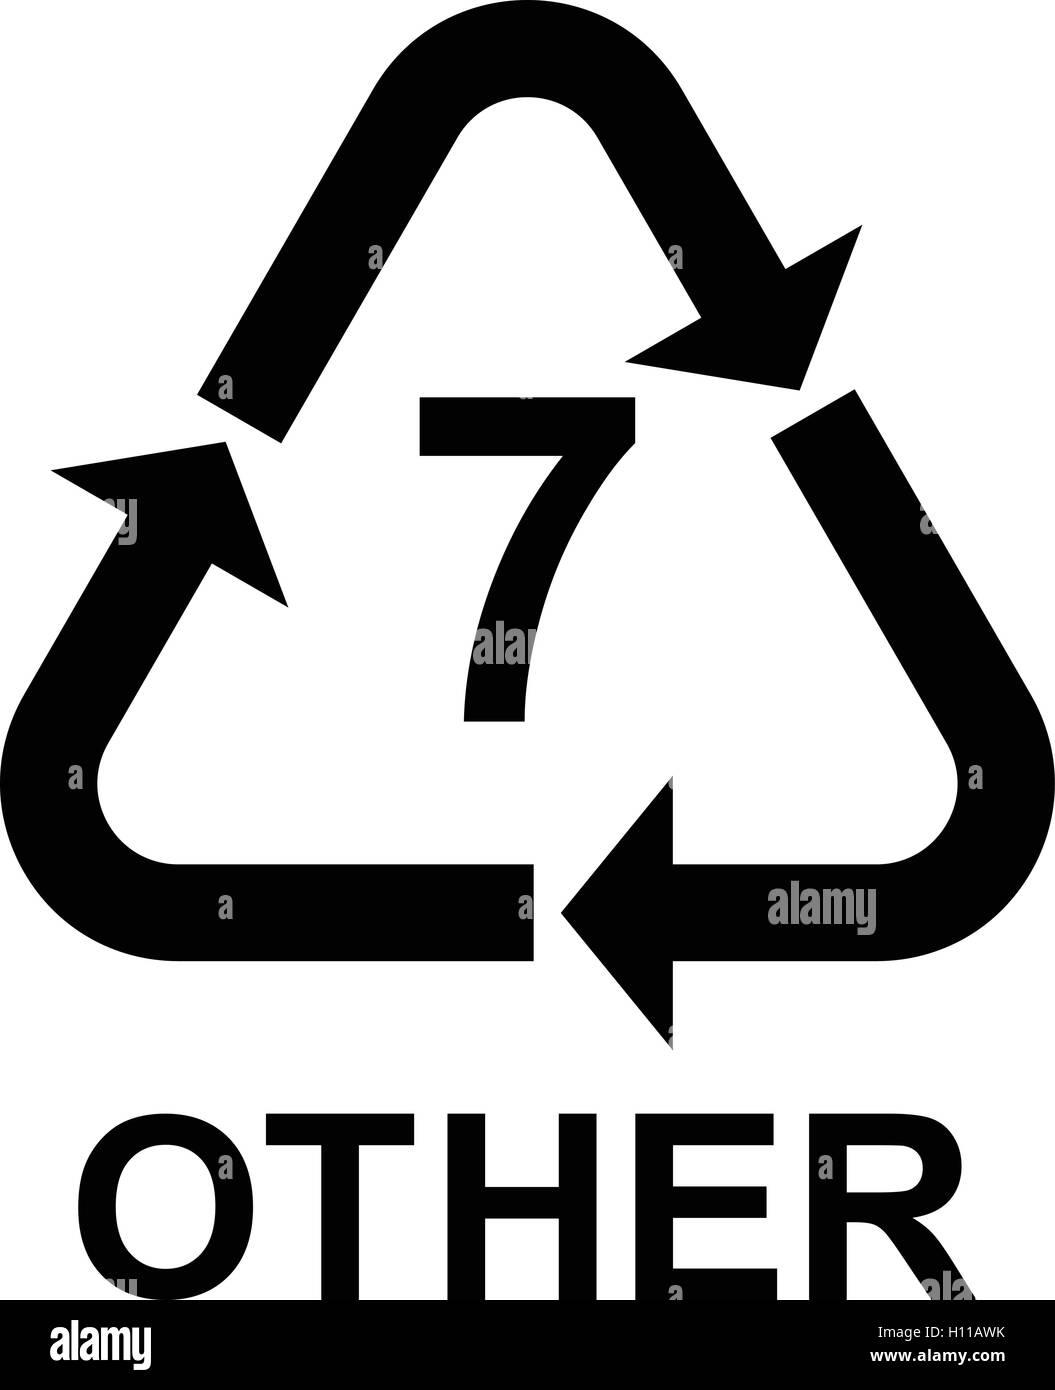 Recycling Sign Mobius Loop Stock Photos Recycling Sign Mobius Loop